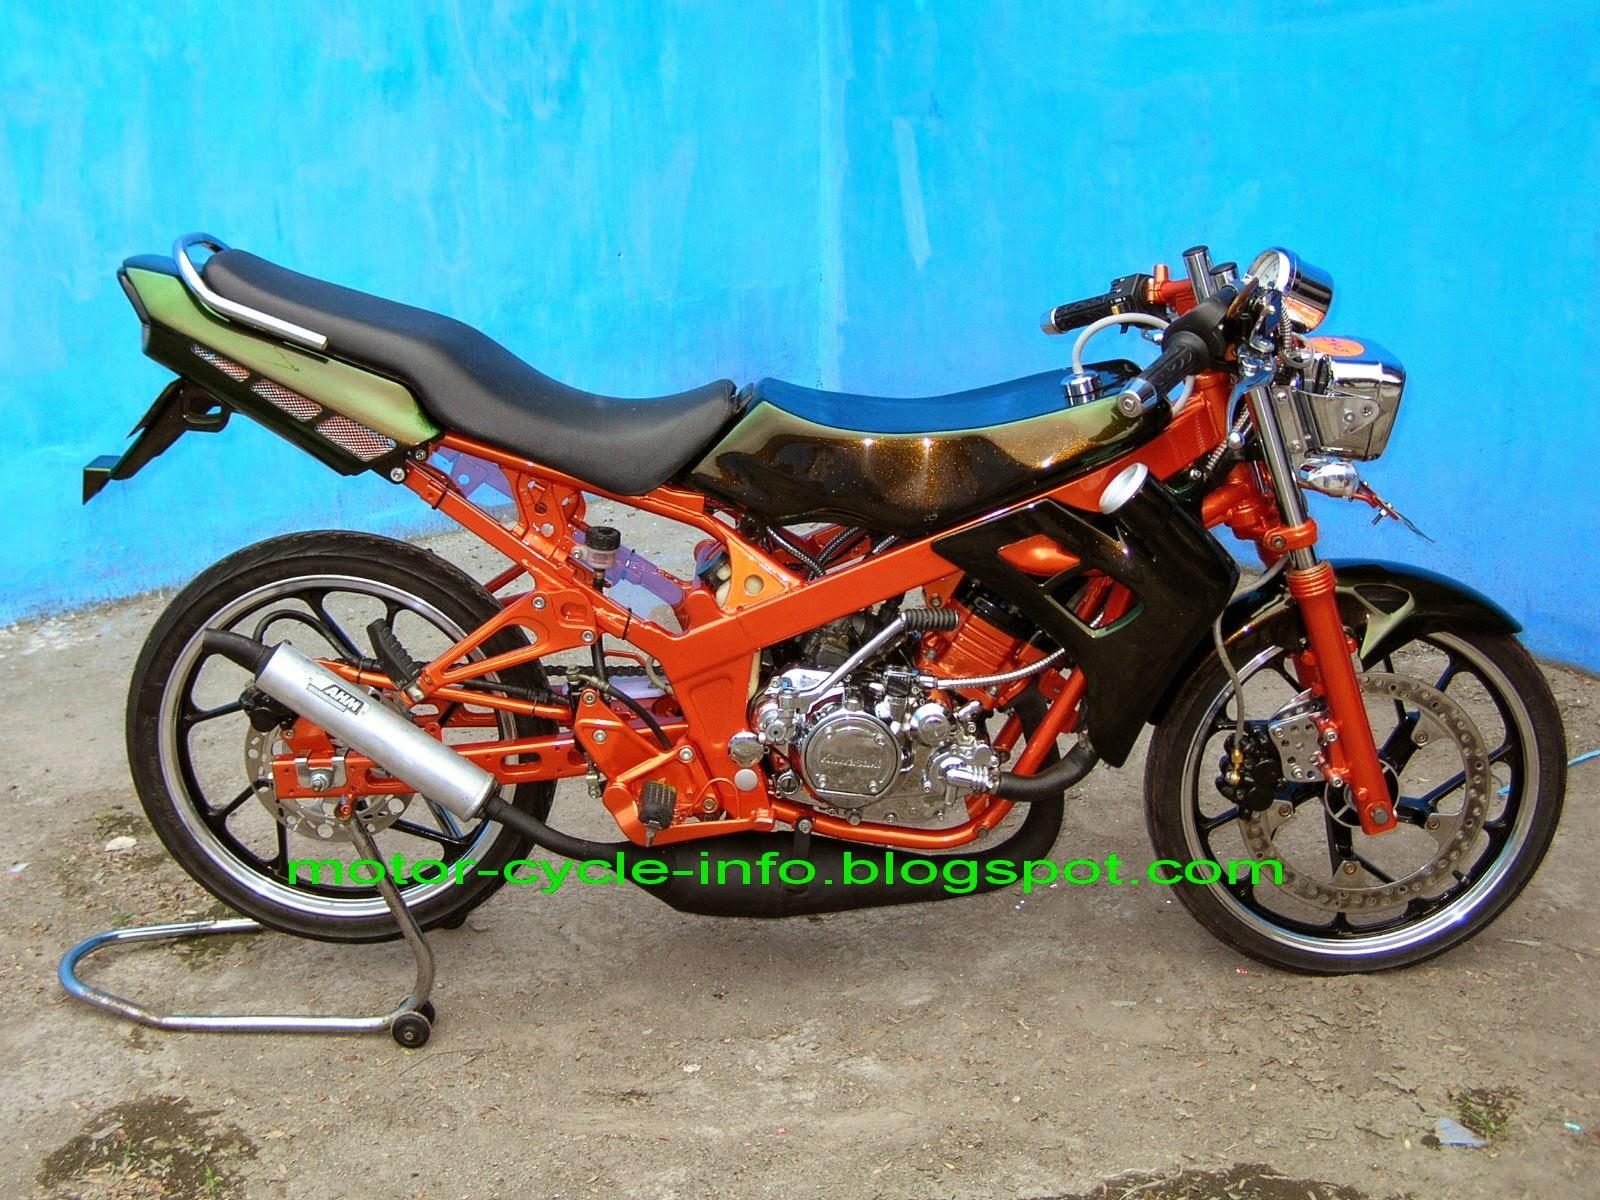 Koleksi Gambar Motor Drag Honda Karisma Terlengkap Kinyis Motor